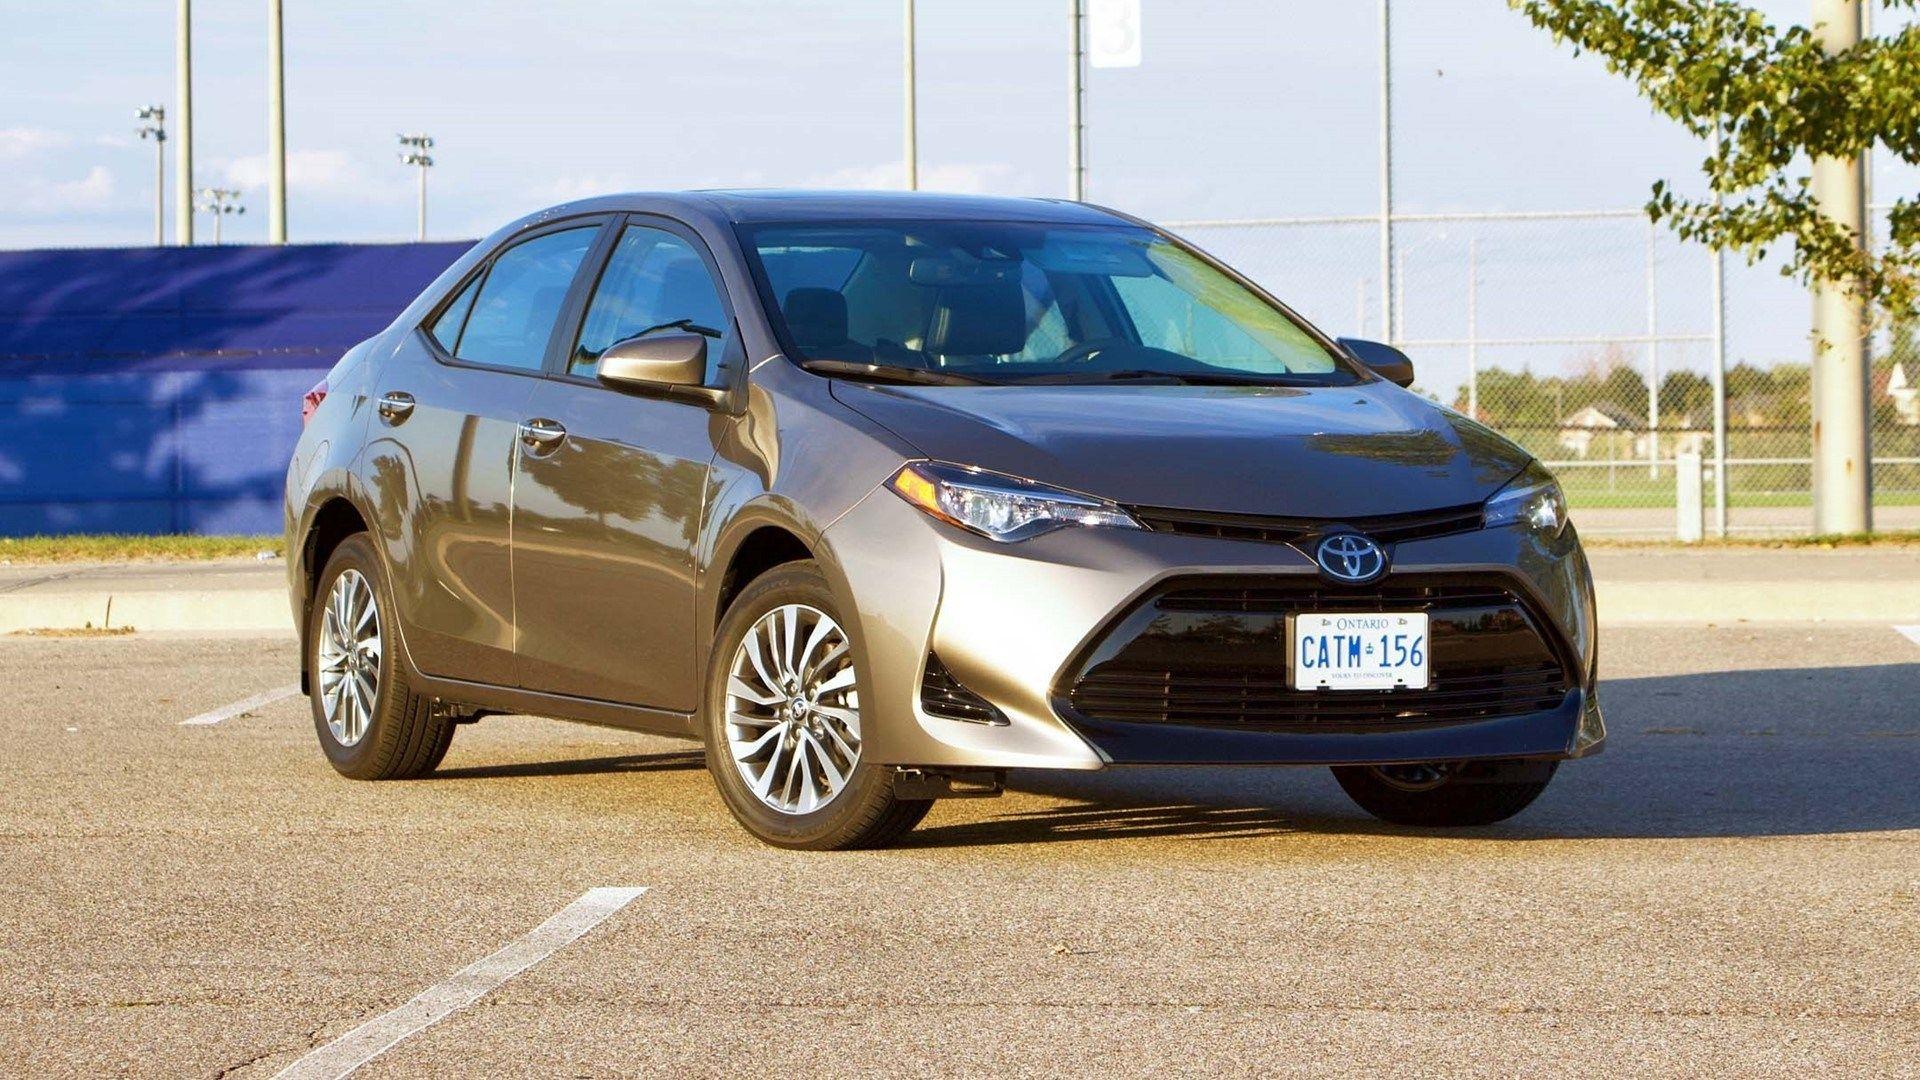 2020 Toyota Corolla Canada Release Date Toyota Corolla Toyota Corolla Price Toyota